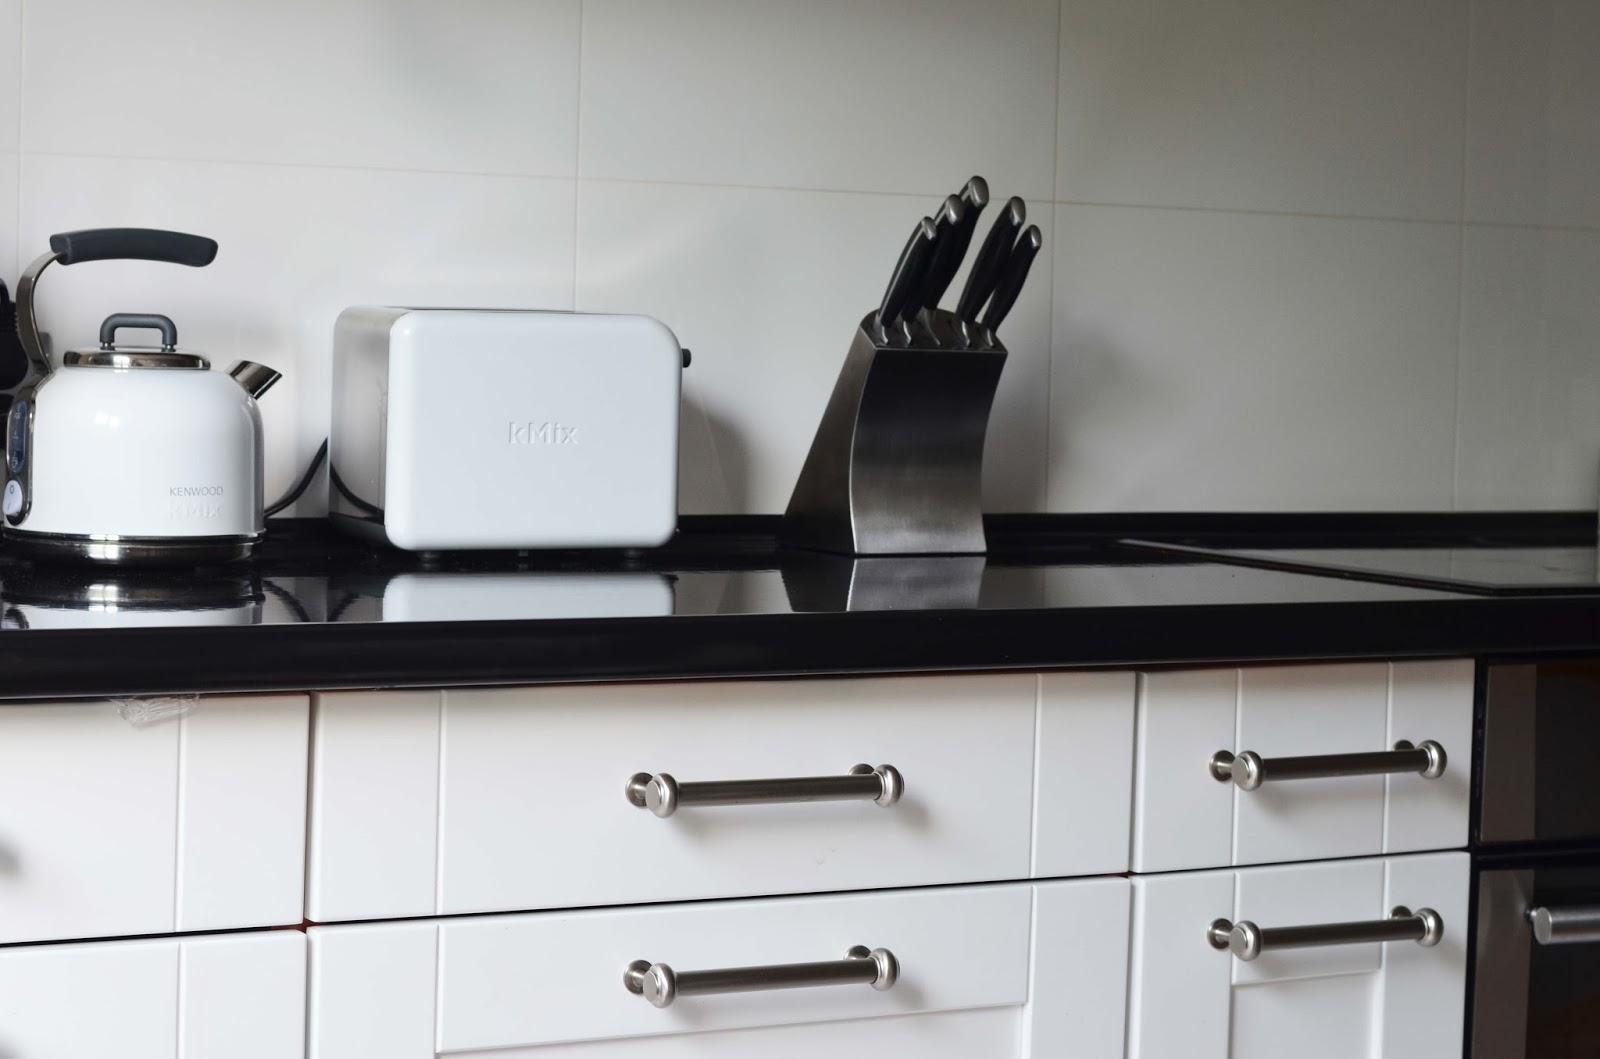 dekorator amator Biała kuchnia  -> Kuchnia Biale Meble Czarny Blat